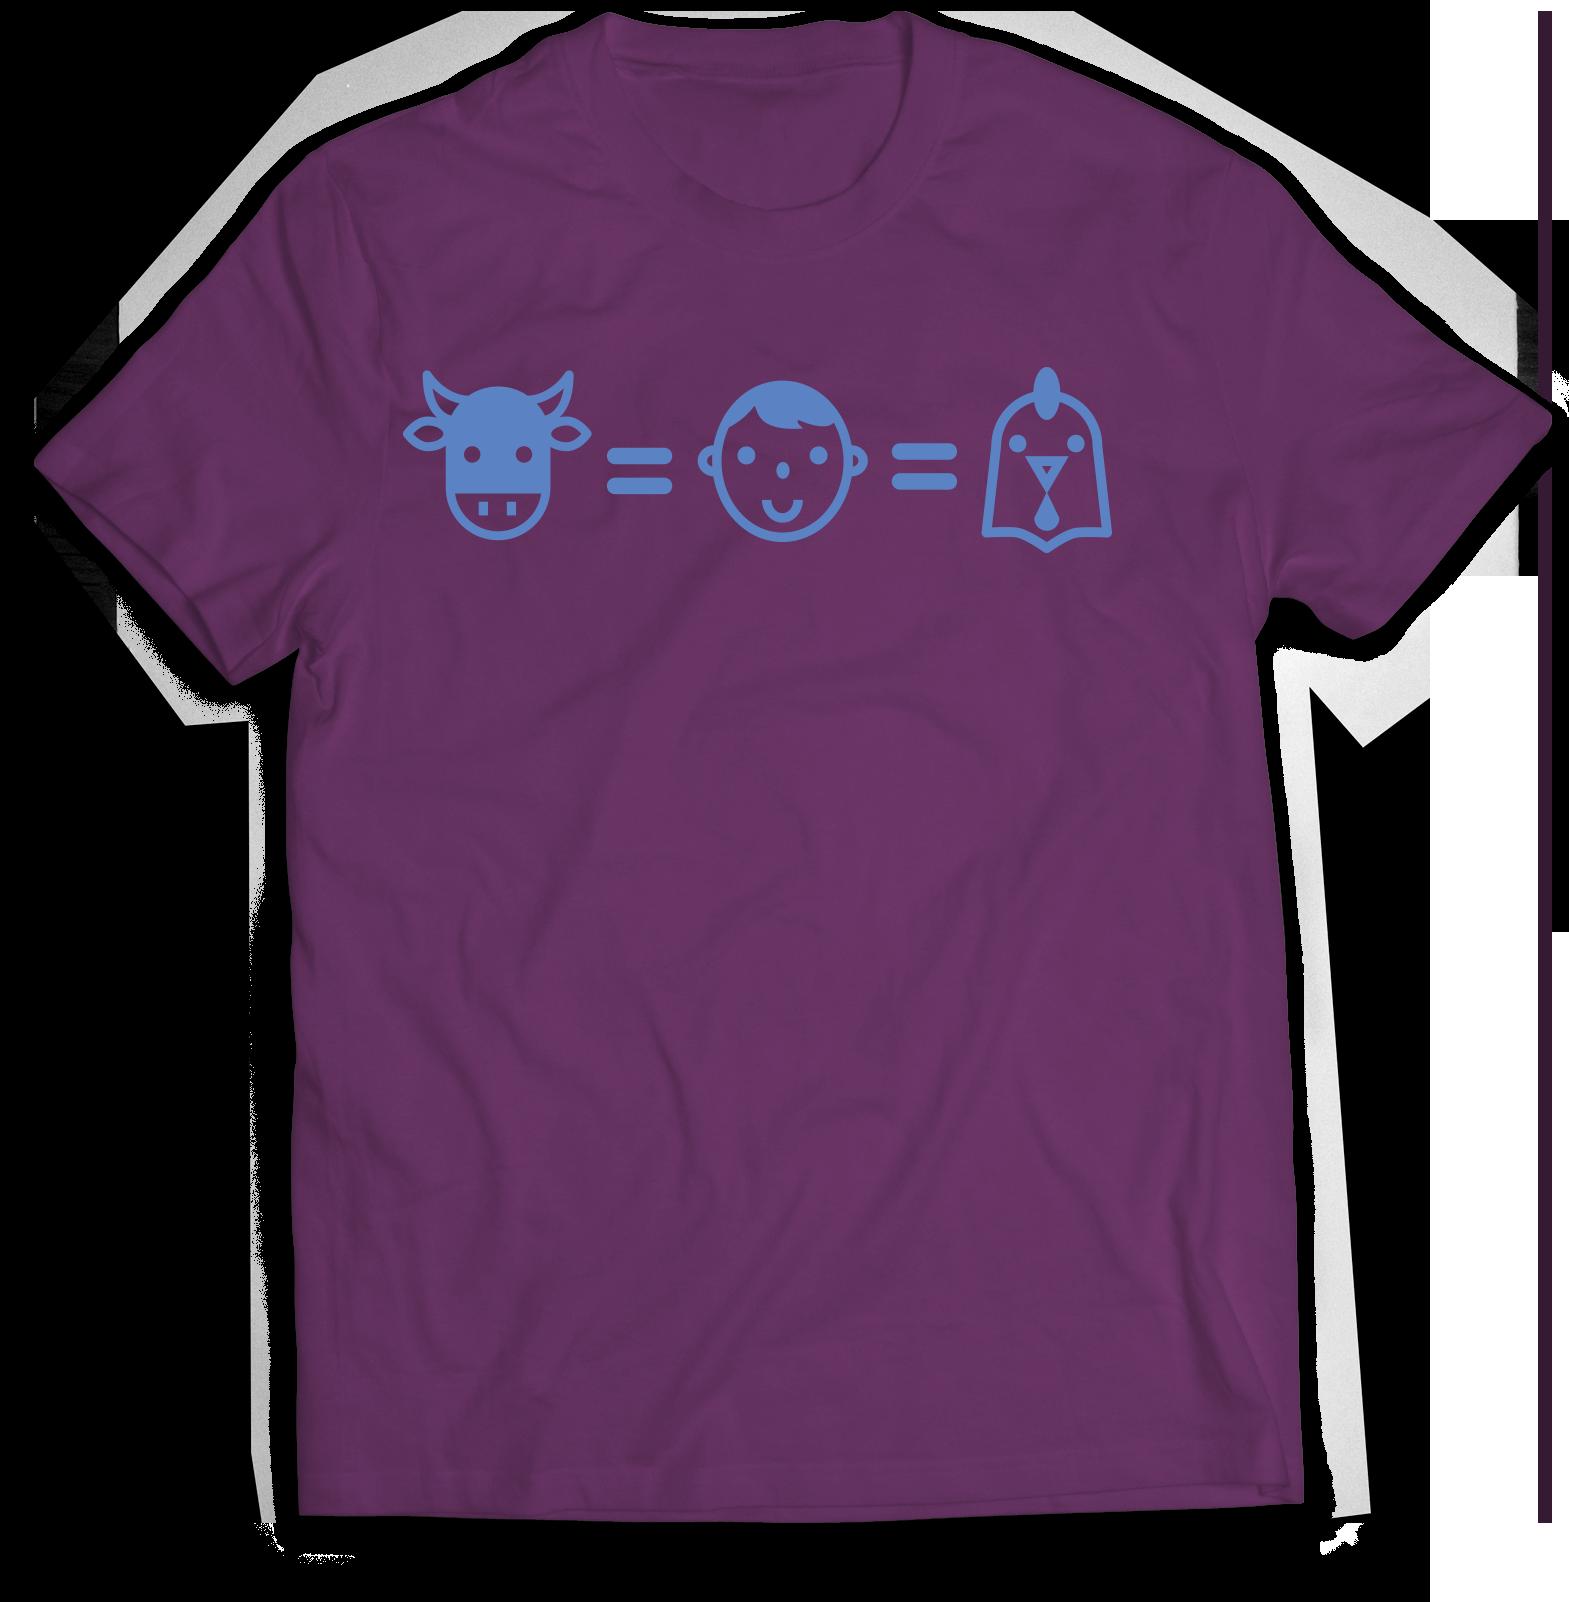 T-Shirt_equality.png